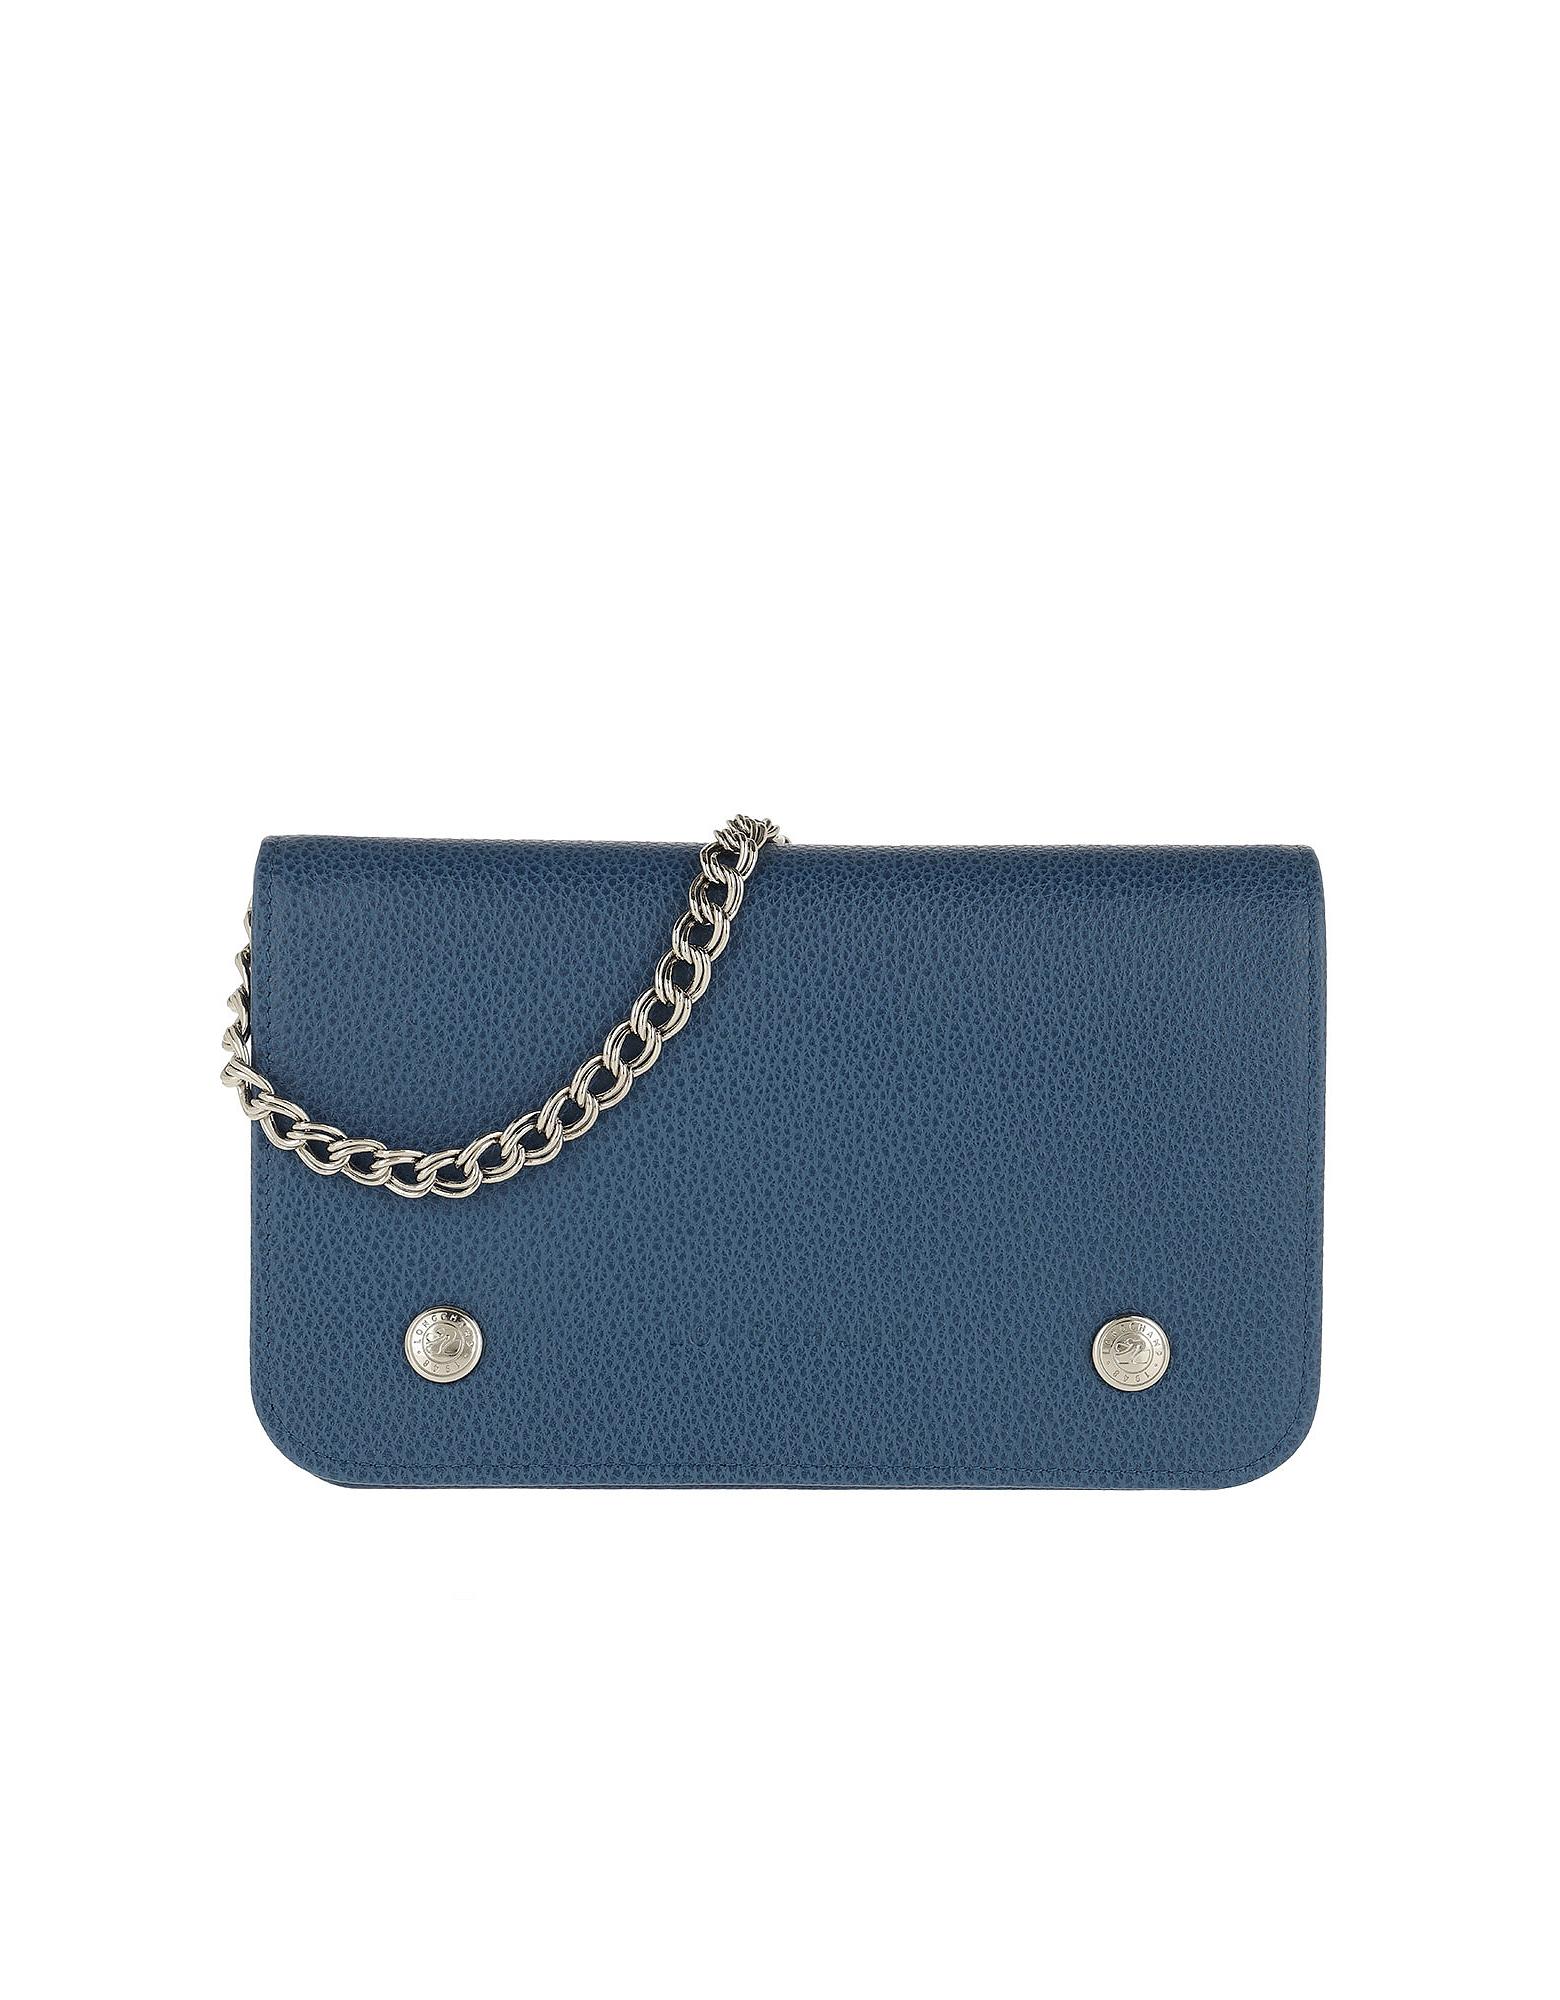 Le Foulonné Wallet On Chain Leather Sapphire